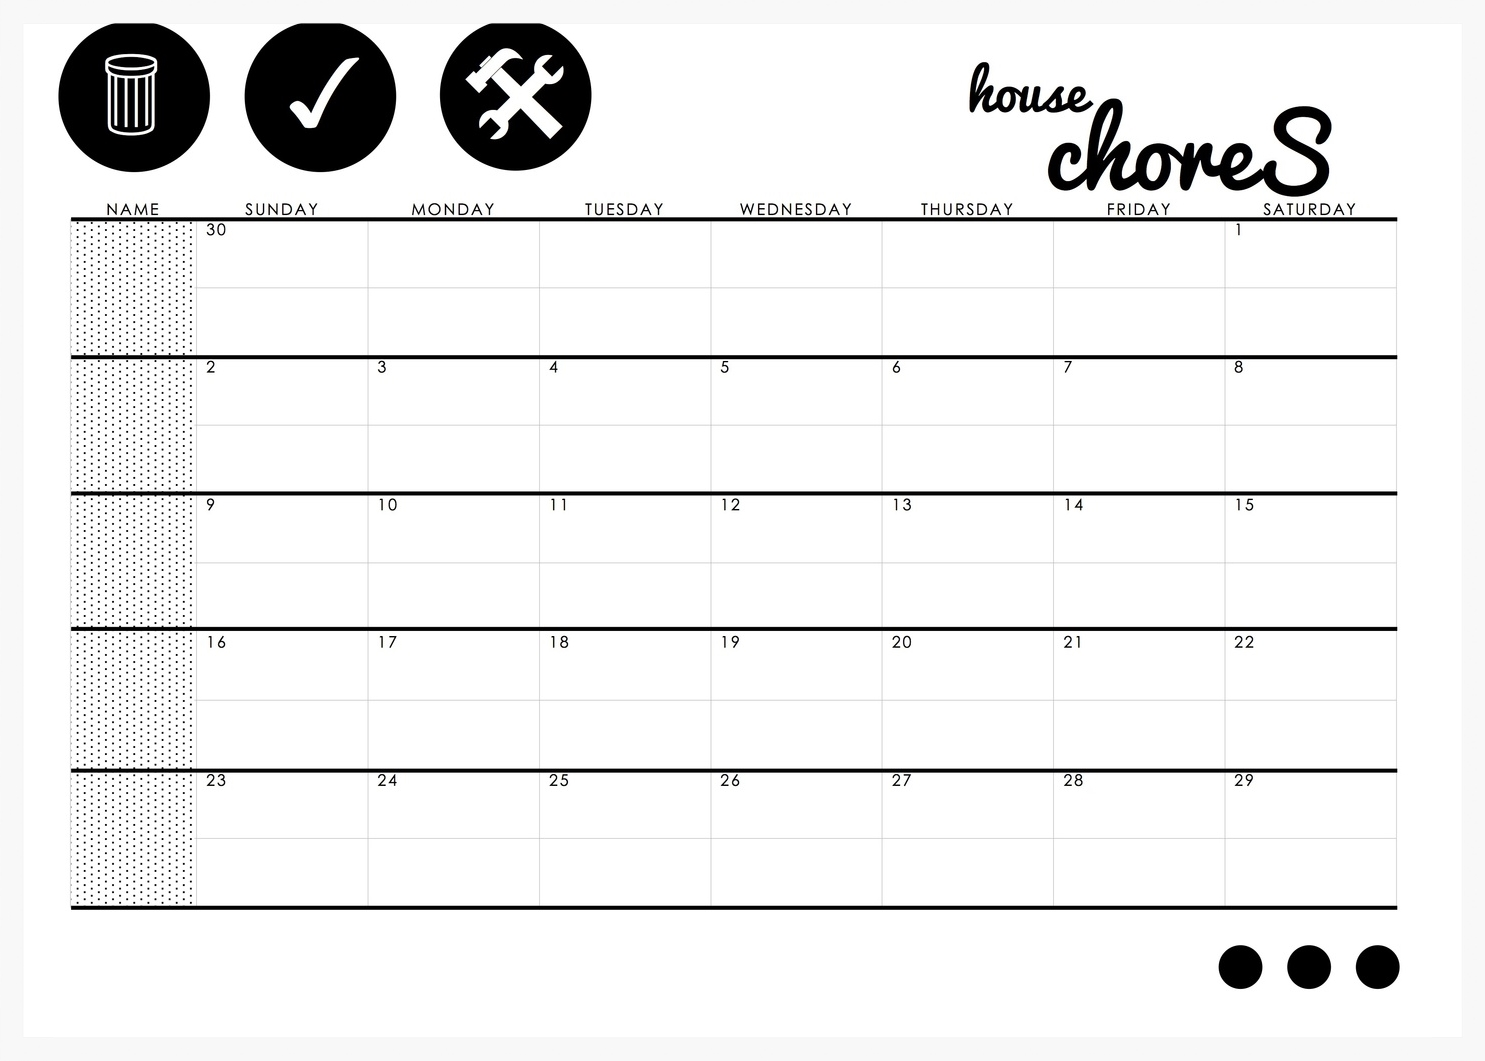 2014-11 - House Chores.jpg